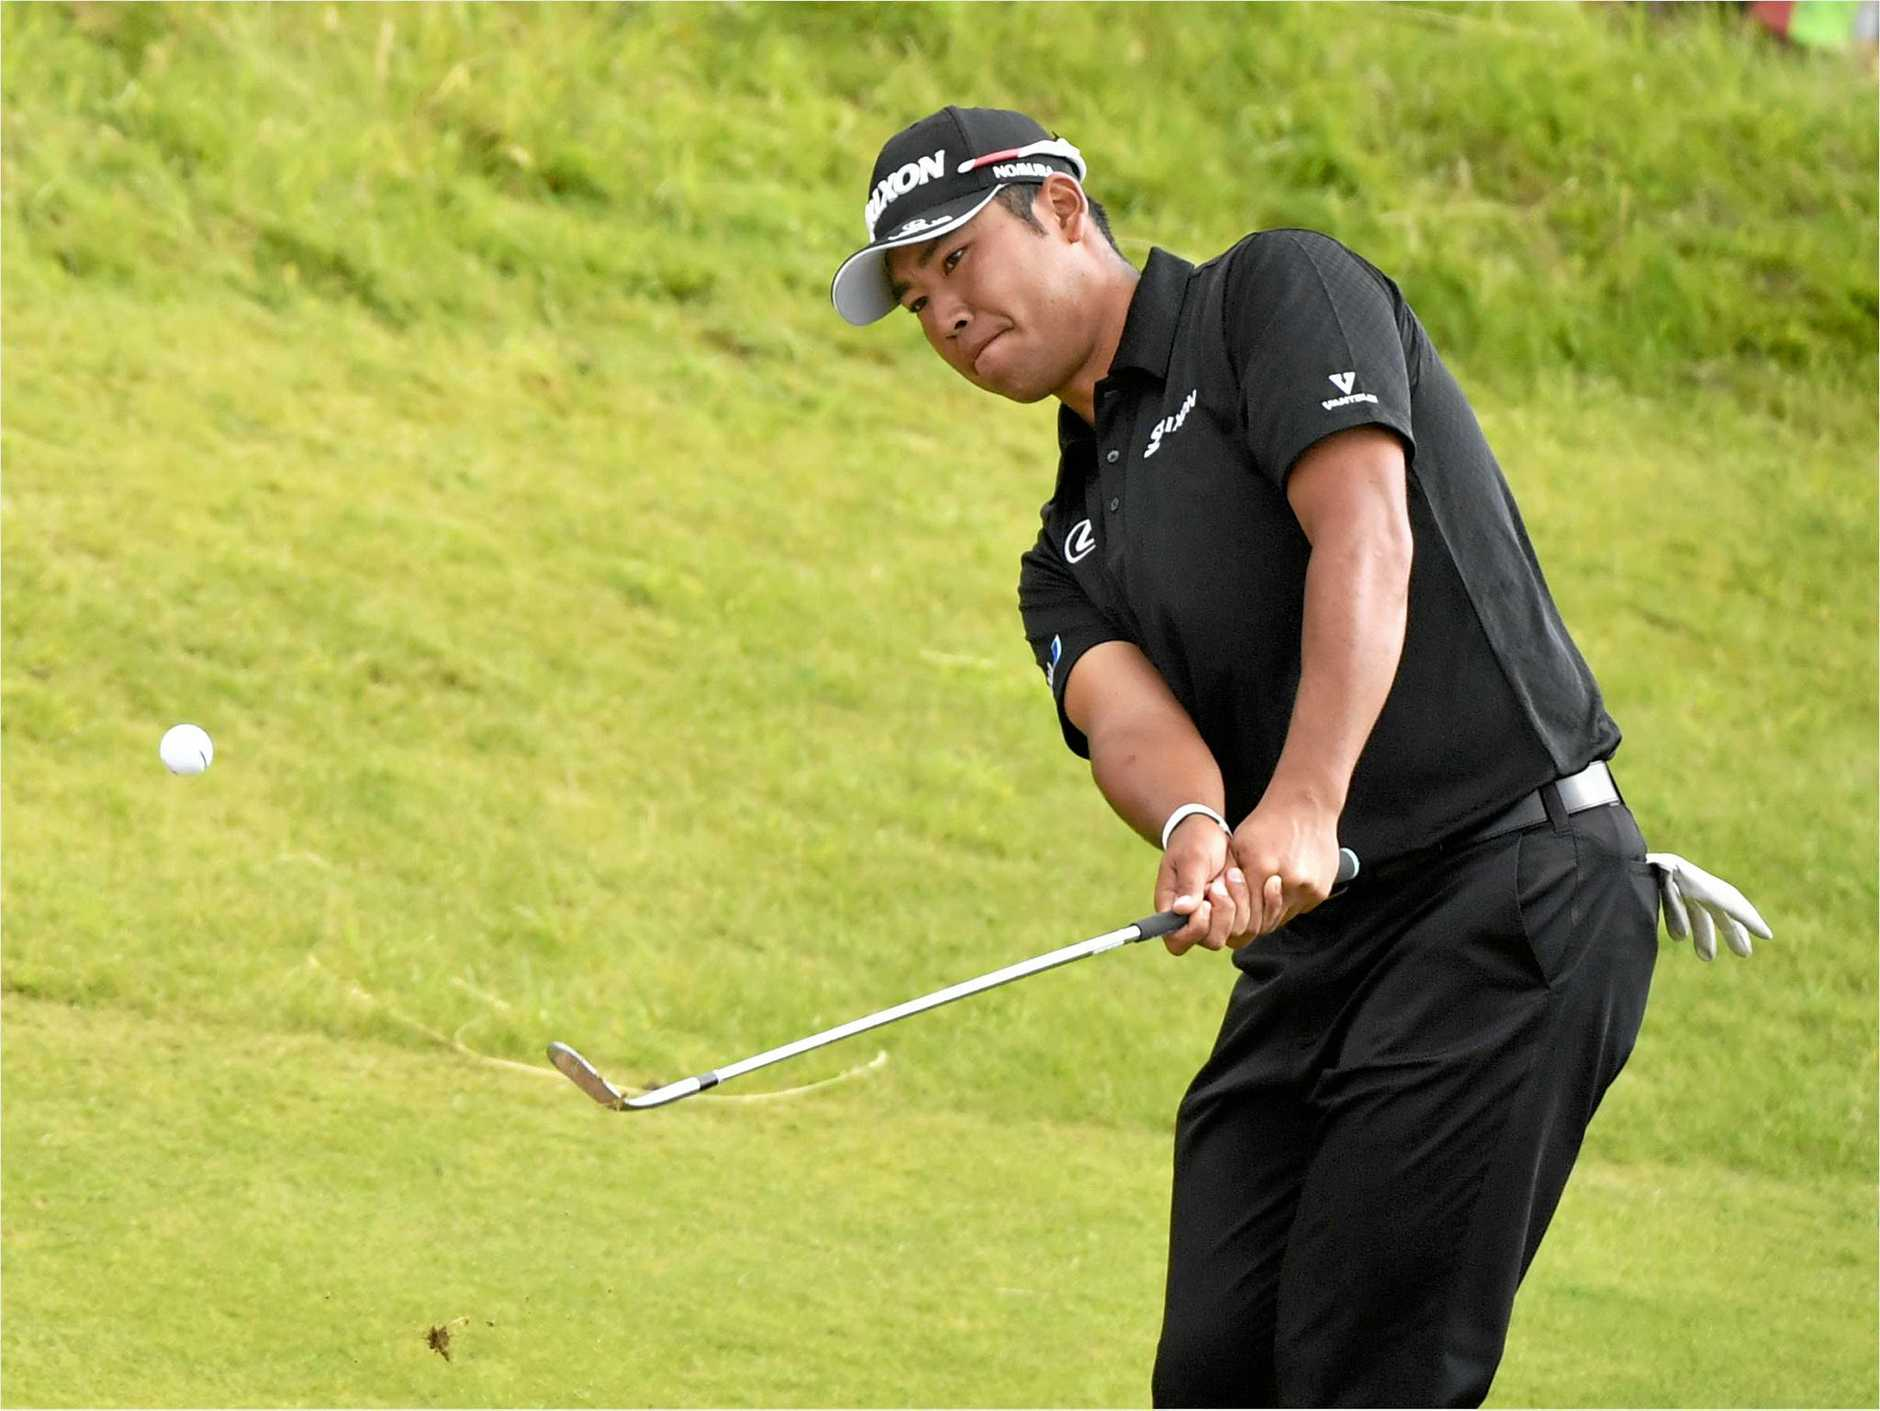 World No.3 Hideki Matsuyama will spearhead the International challenge in the Presidents Cup.